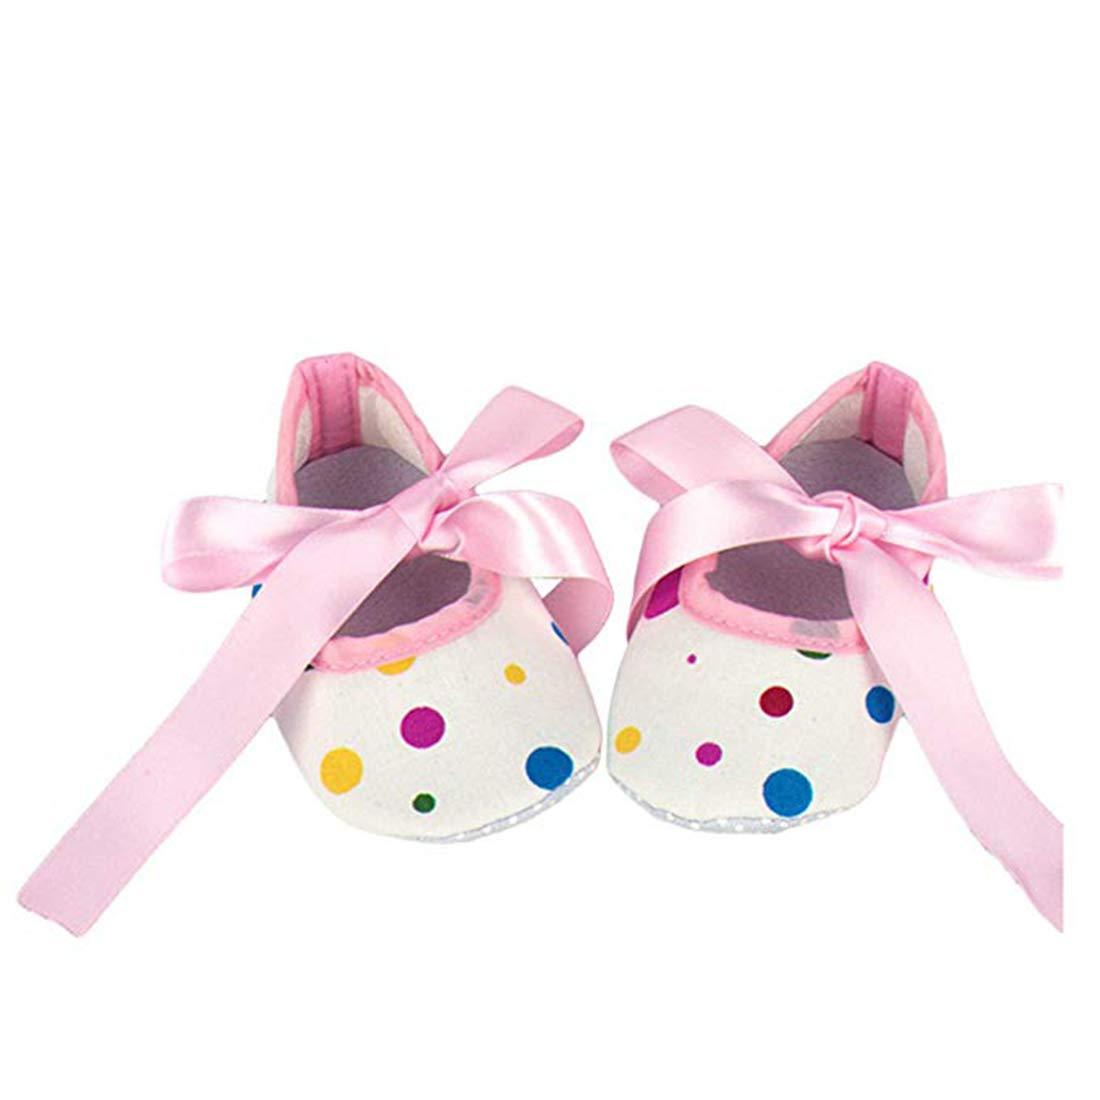 ALLAIBB Easter Baby Girl Outfit Short Sleeve Bodysuit Tutu Dress Romper 3Pcs Set